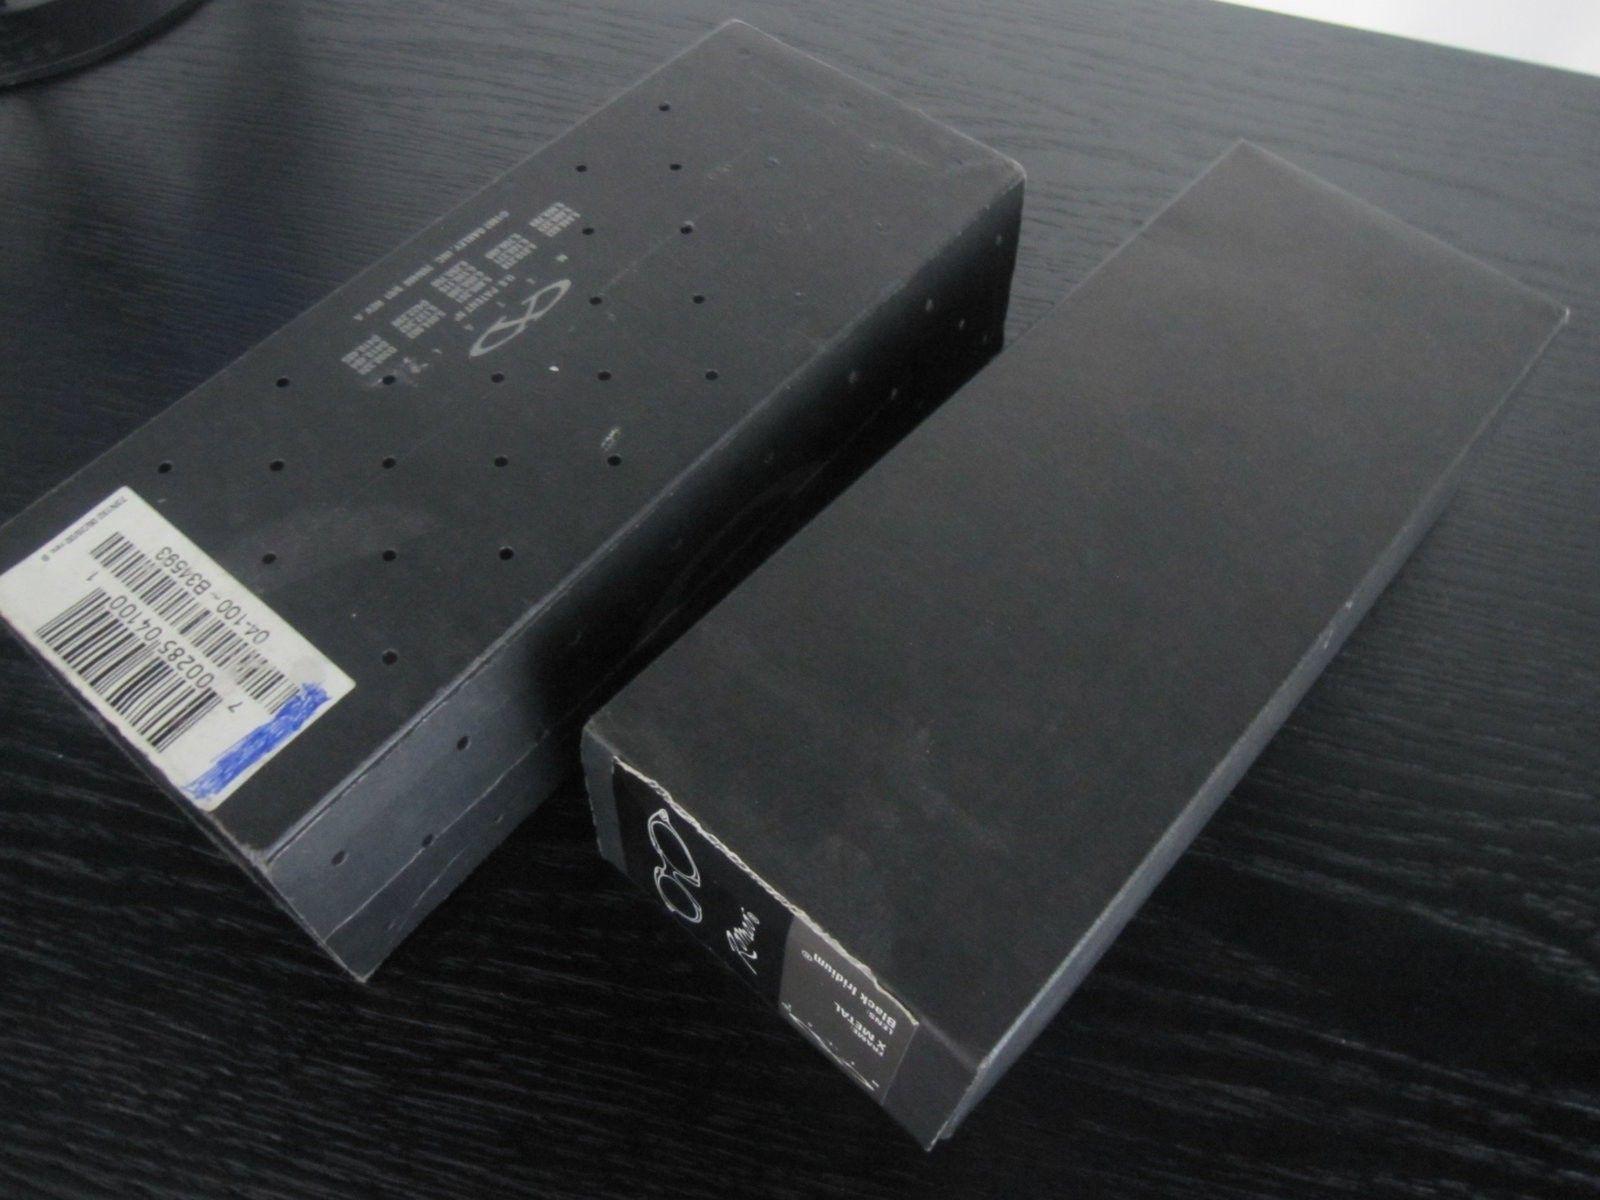 Box for Romeo 1 XM/Black Iridium - $85 - IMG_5618.JPG